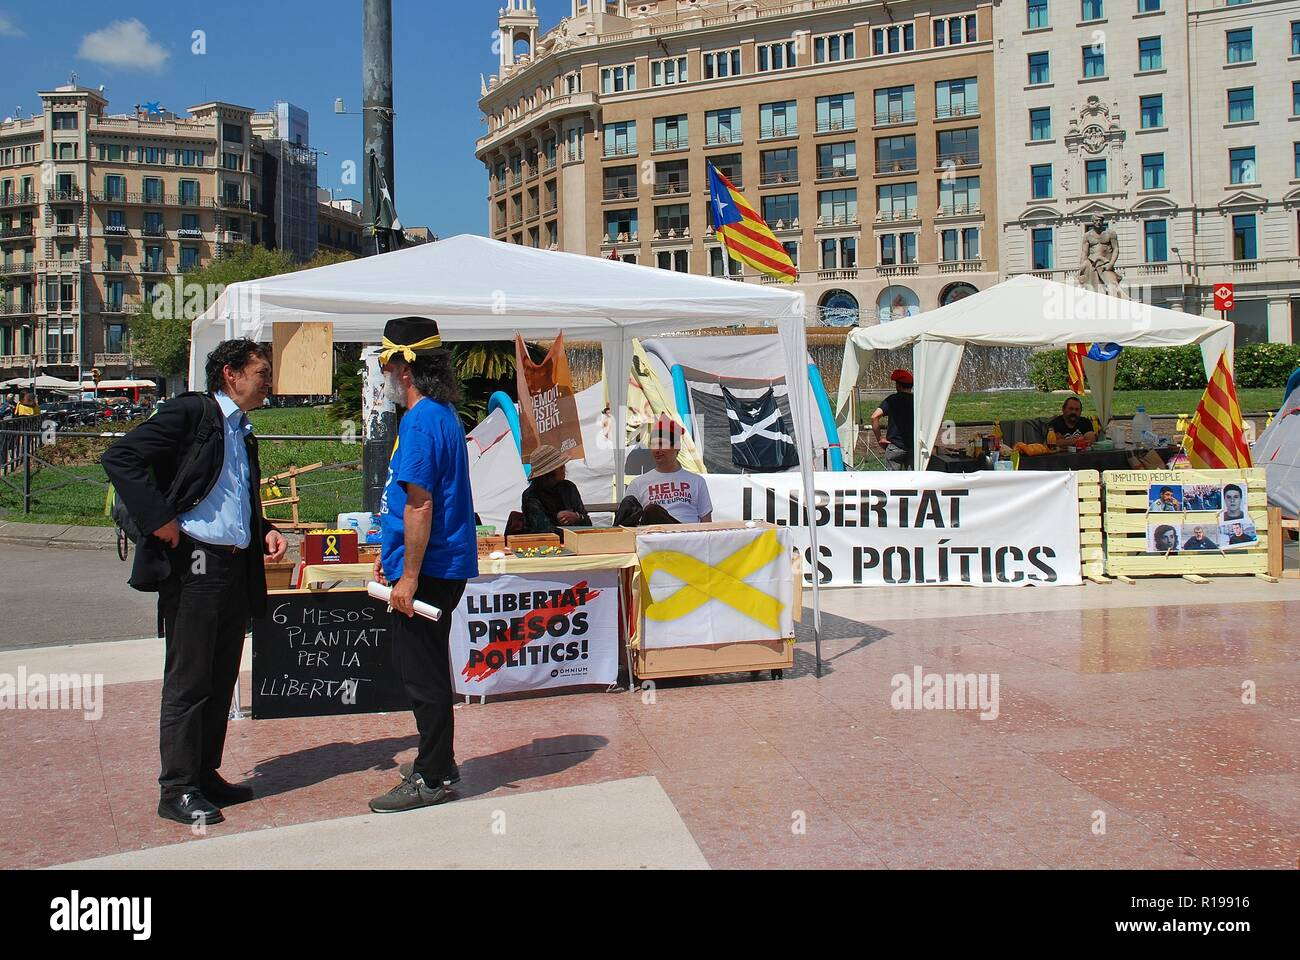 Campaigners for the Llibertat Presos Politics (Free Political Prisoners) movement campaign in Placa Catalunya in Barcelona, Spain on April 17, 2018. Stock Photo